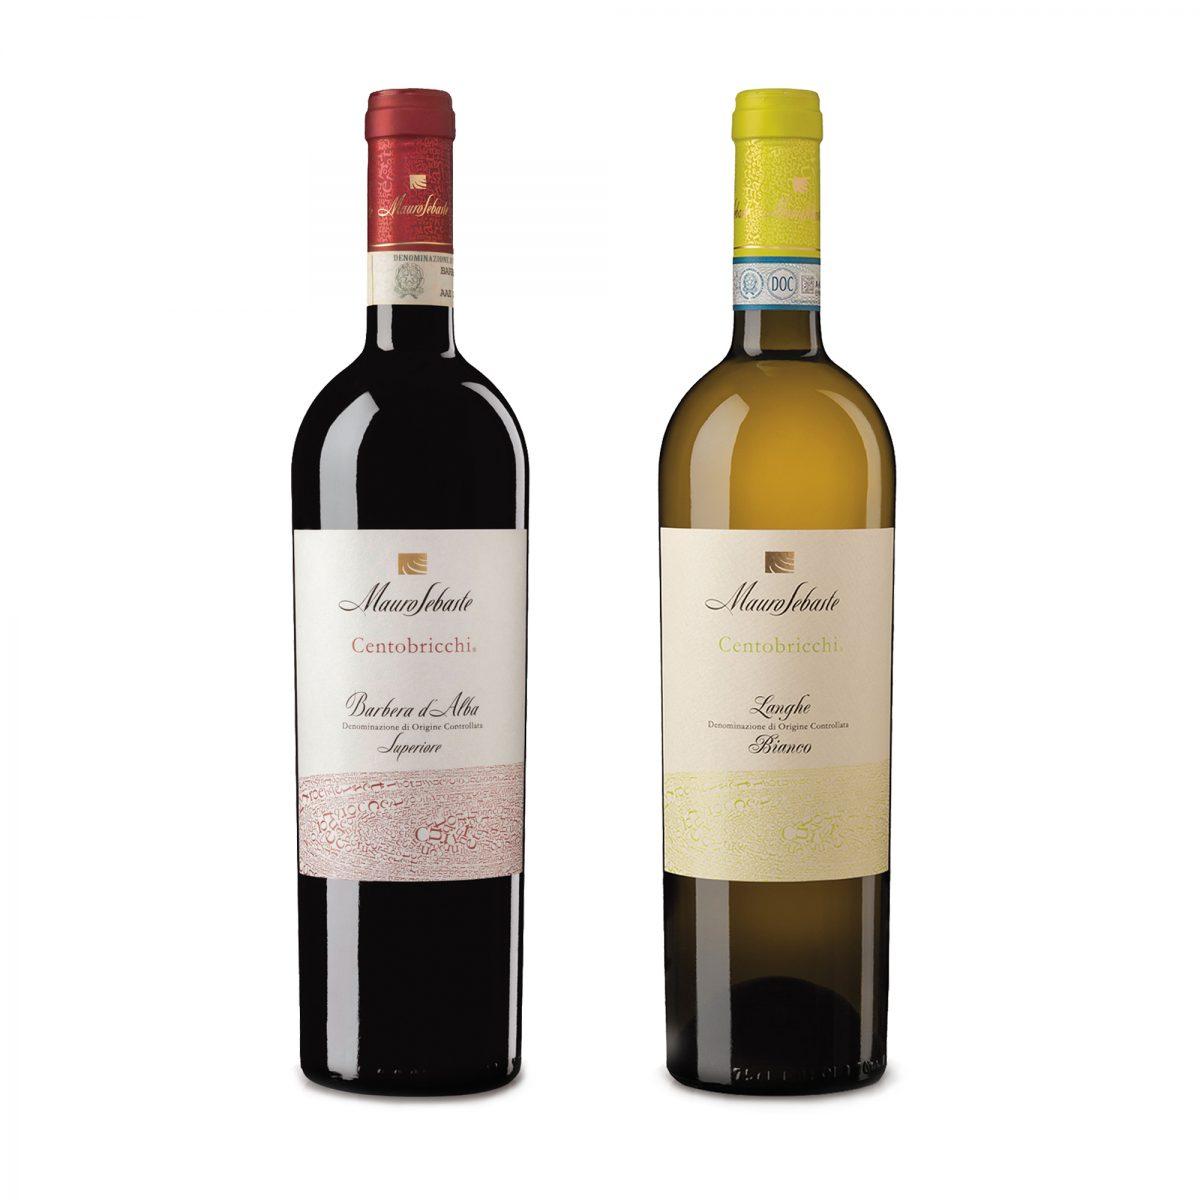 Piedmont Barbera & Viognier - 2 pack